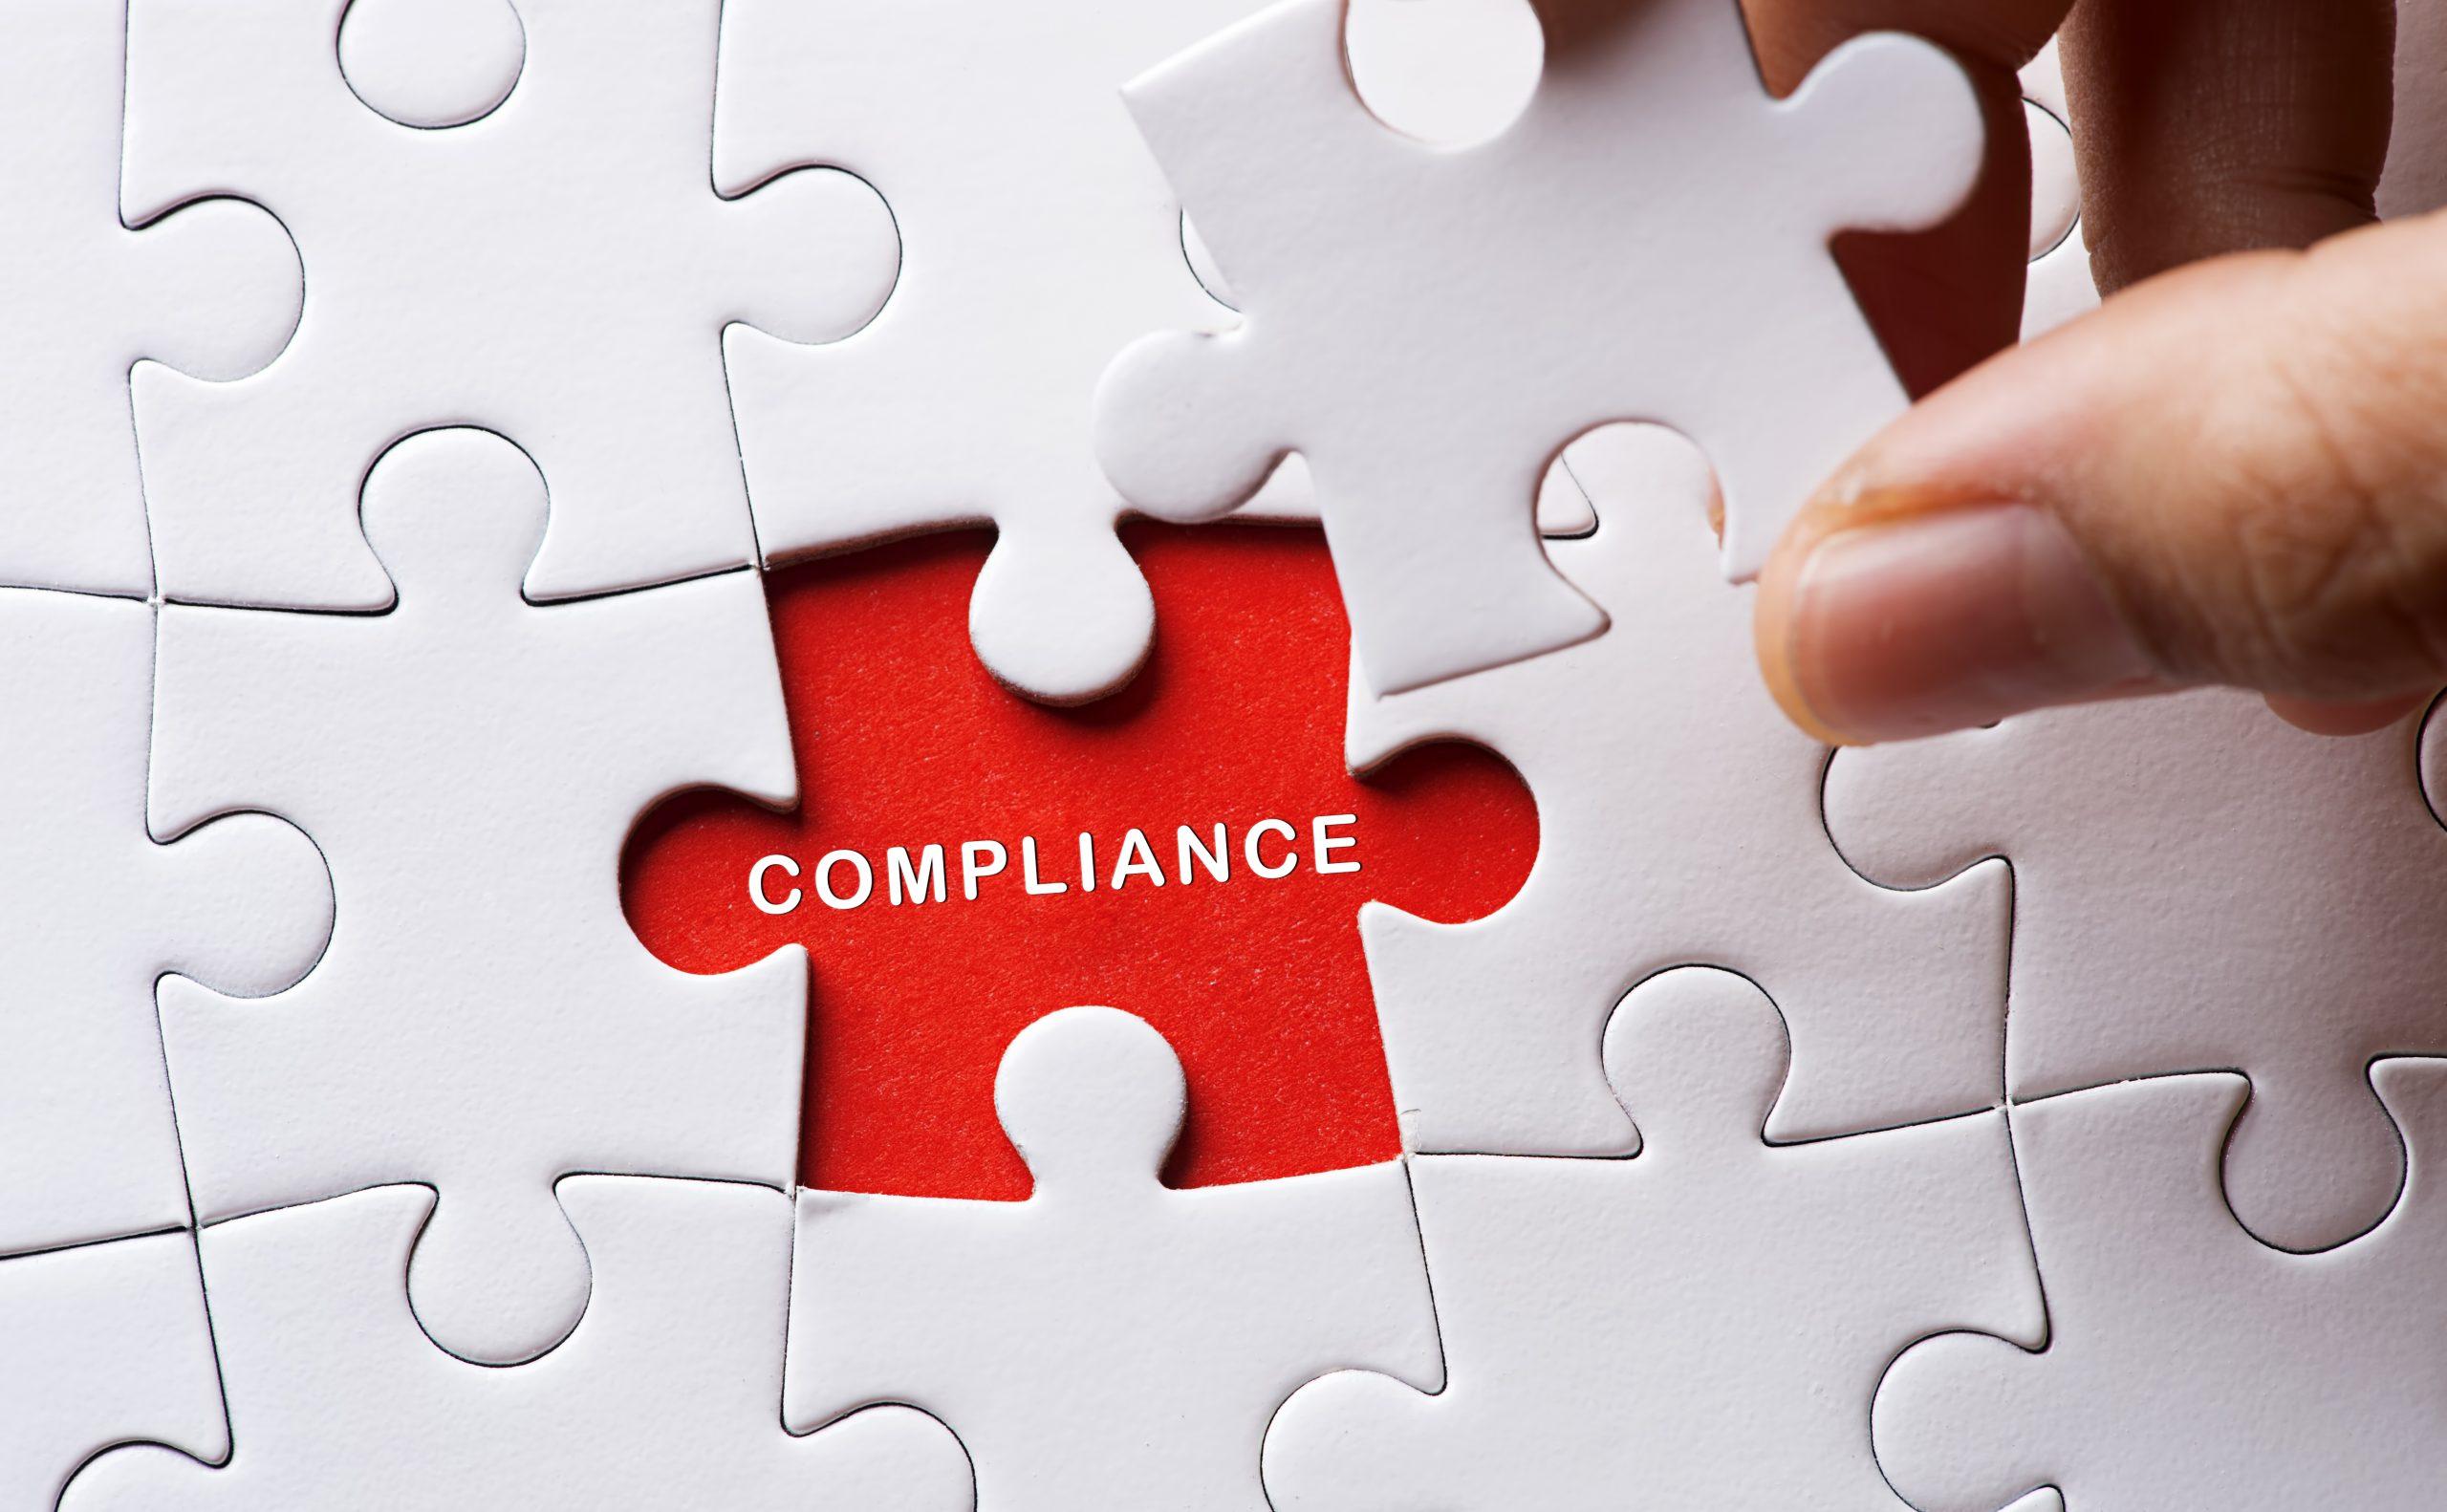 Compliance Jigsaw